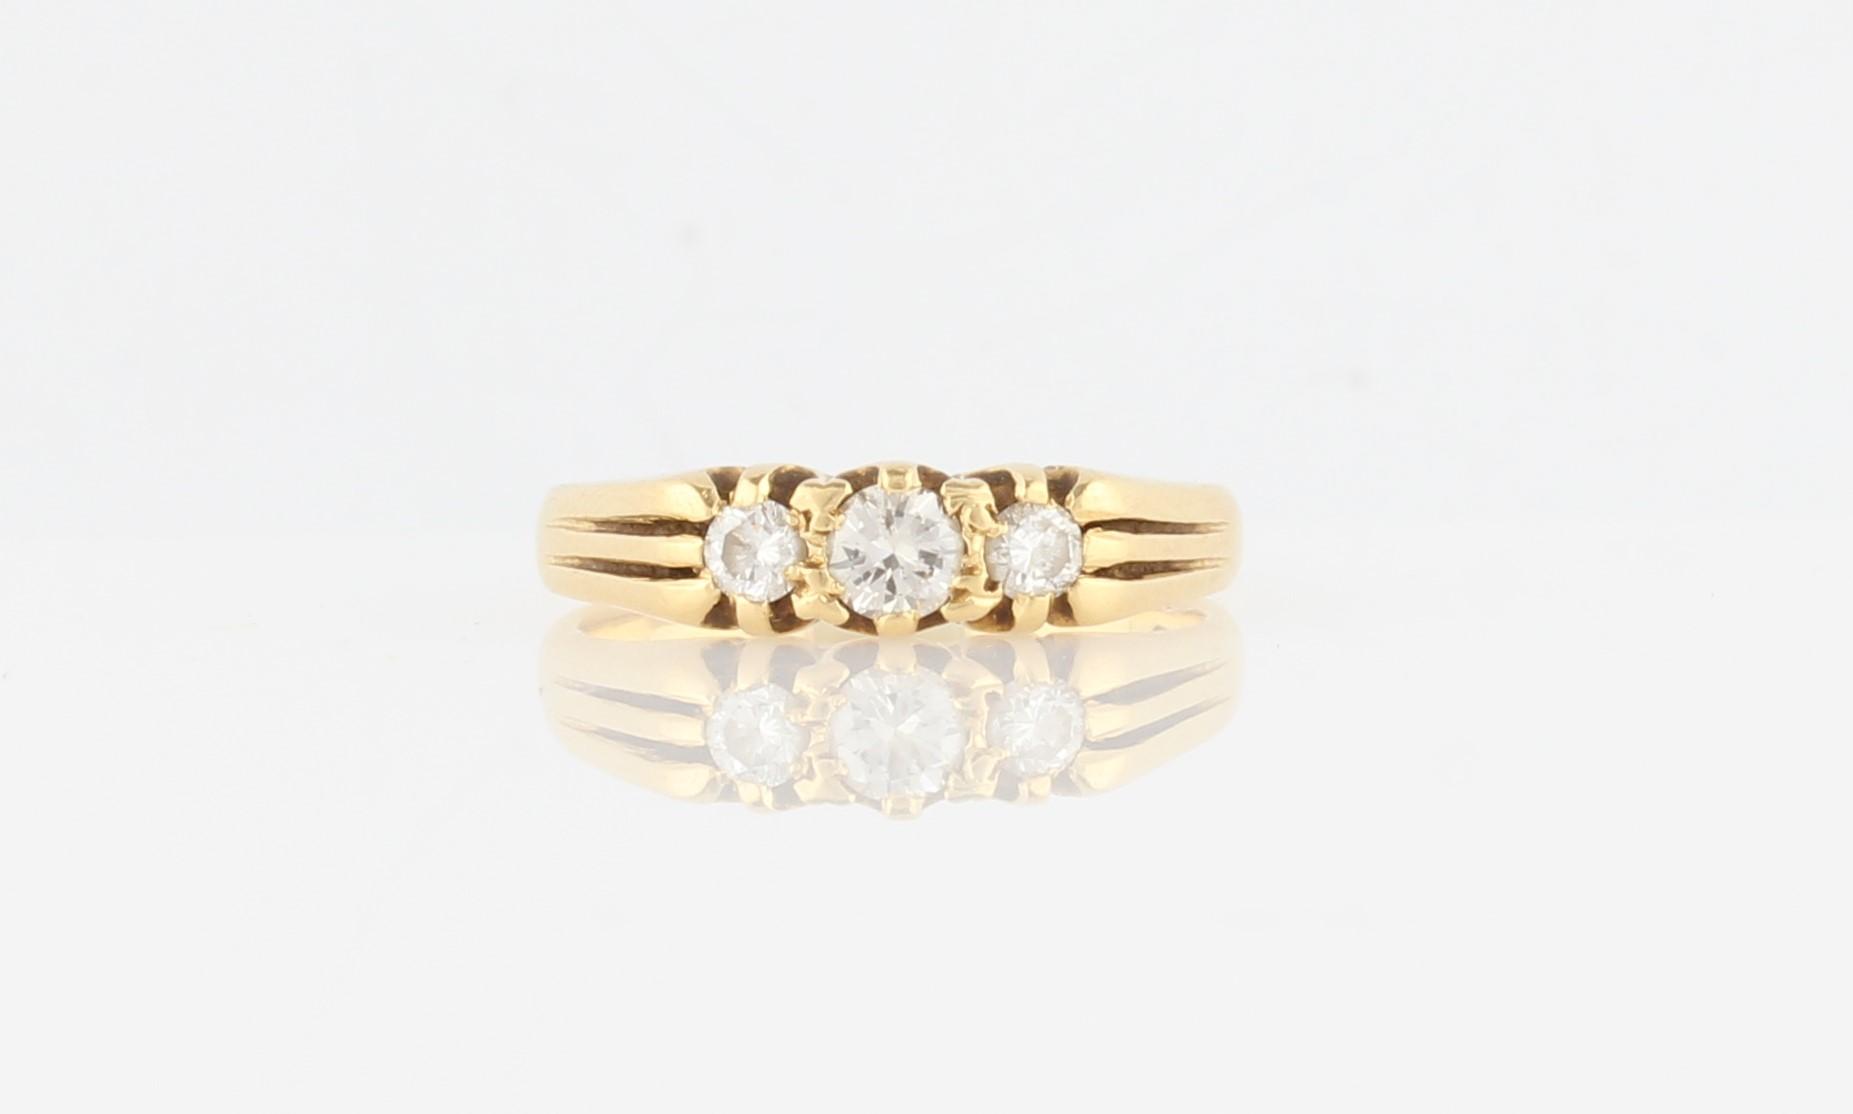 Lot 33 - A hallmarked 18ct yellow gold three stone diamond ring, set with three graduated round brilliant cut